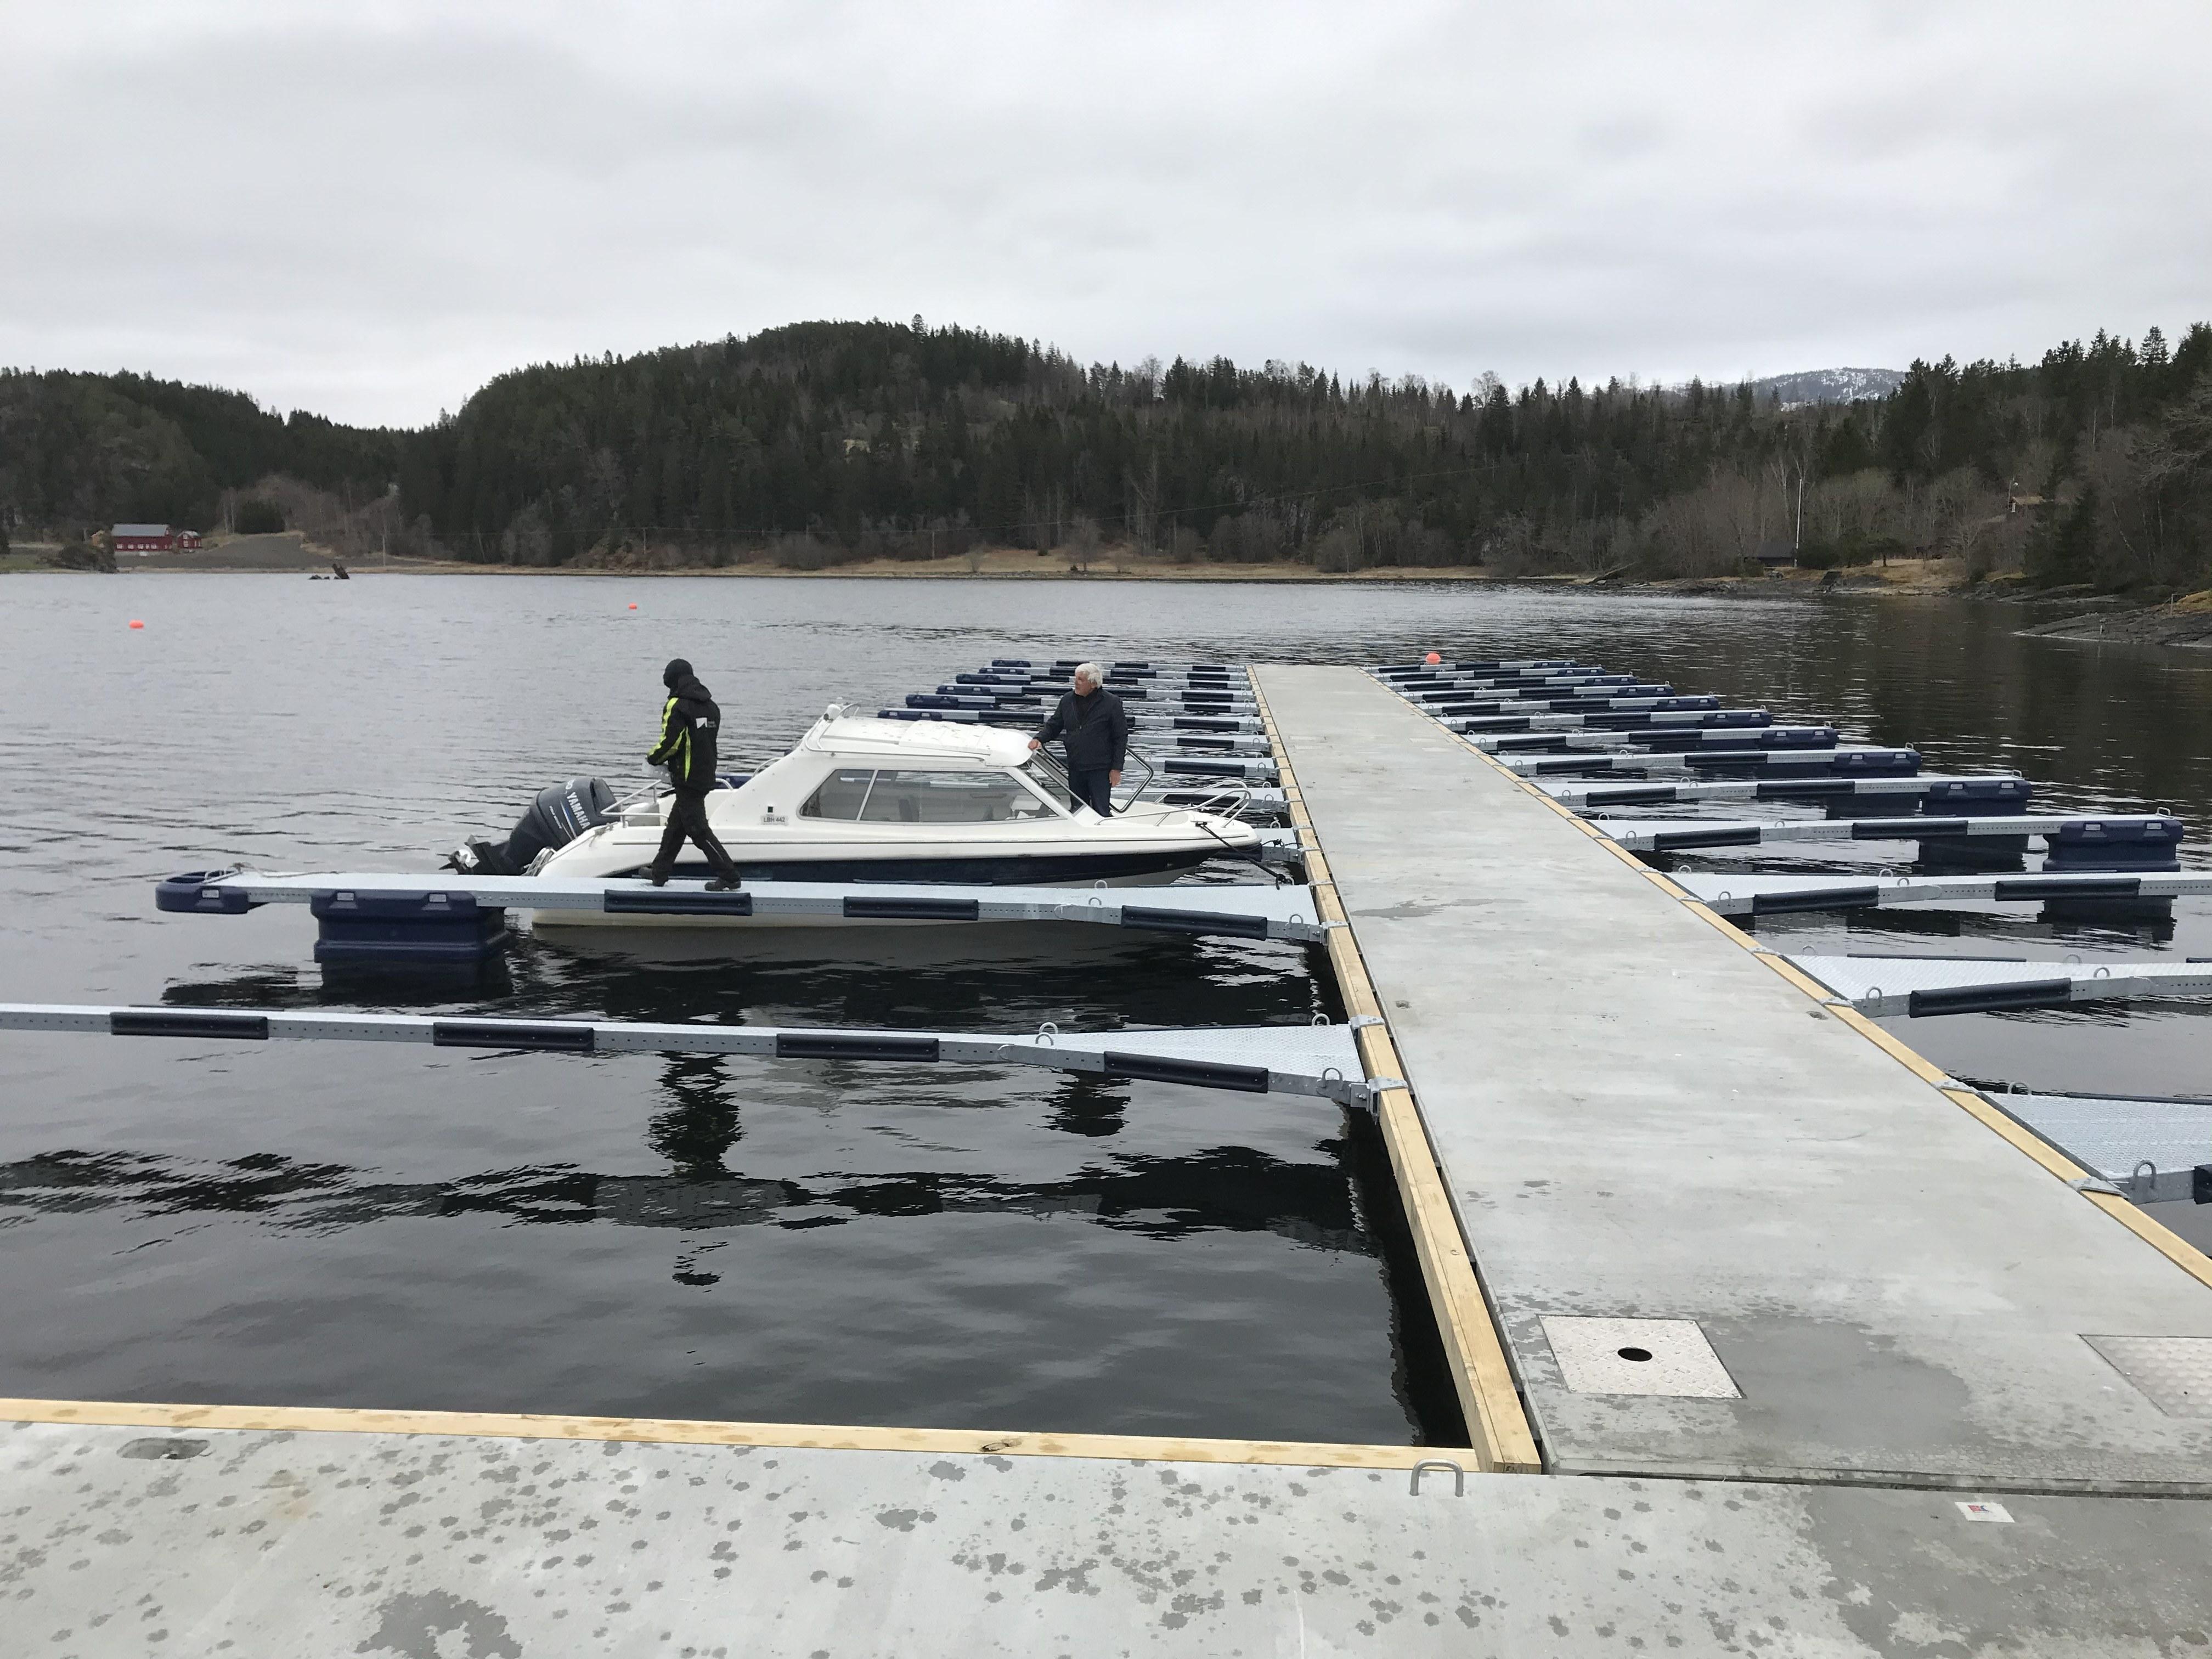 https://www.marinasolutions.no/uploads/Undli-Kai-Bryggeforening_Åsenfjord-1.jpg